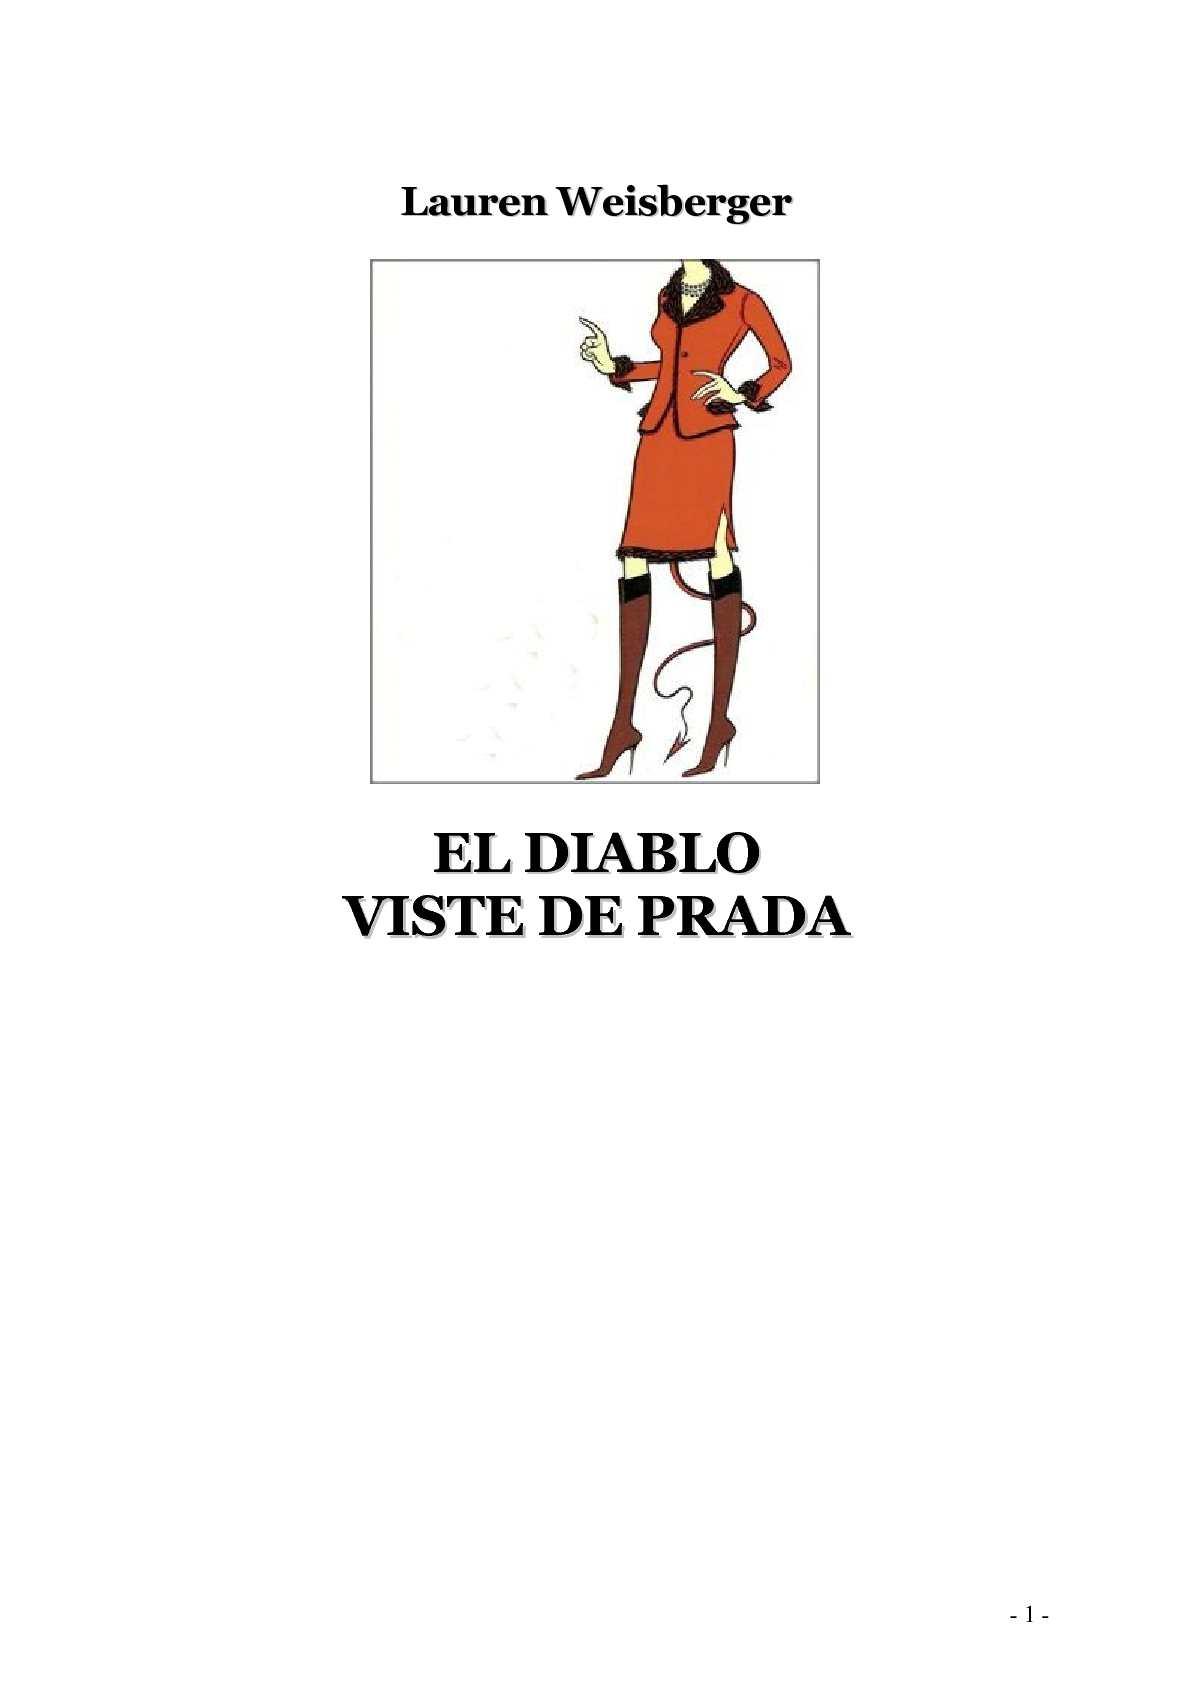 1d009539 Calaméo - Weisberger - El diablo viste de Prada